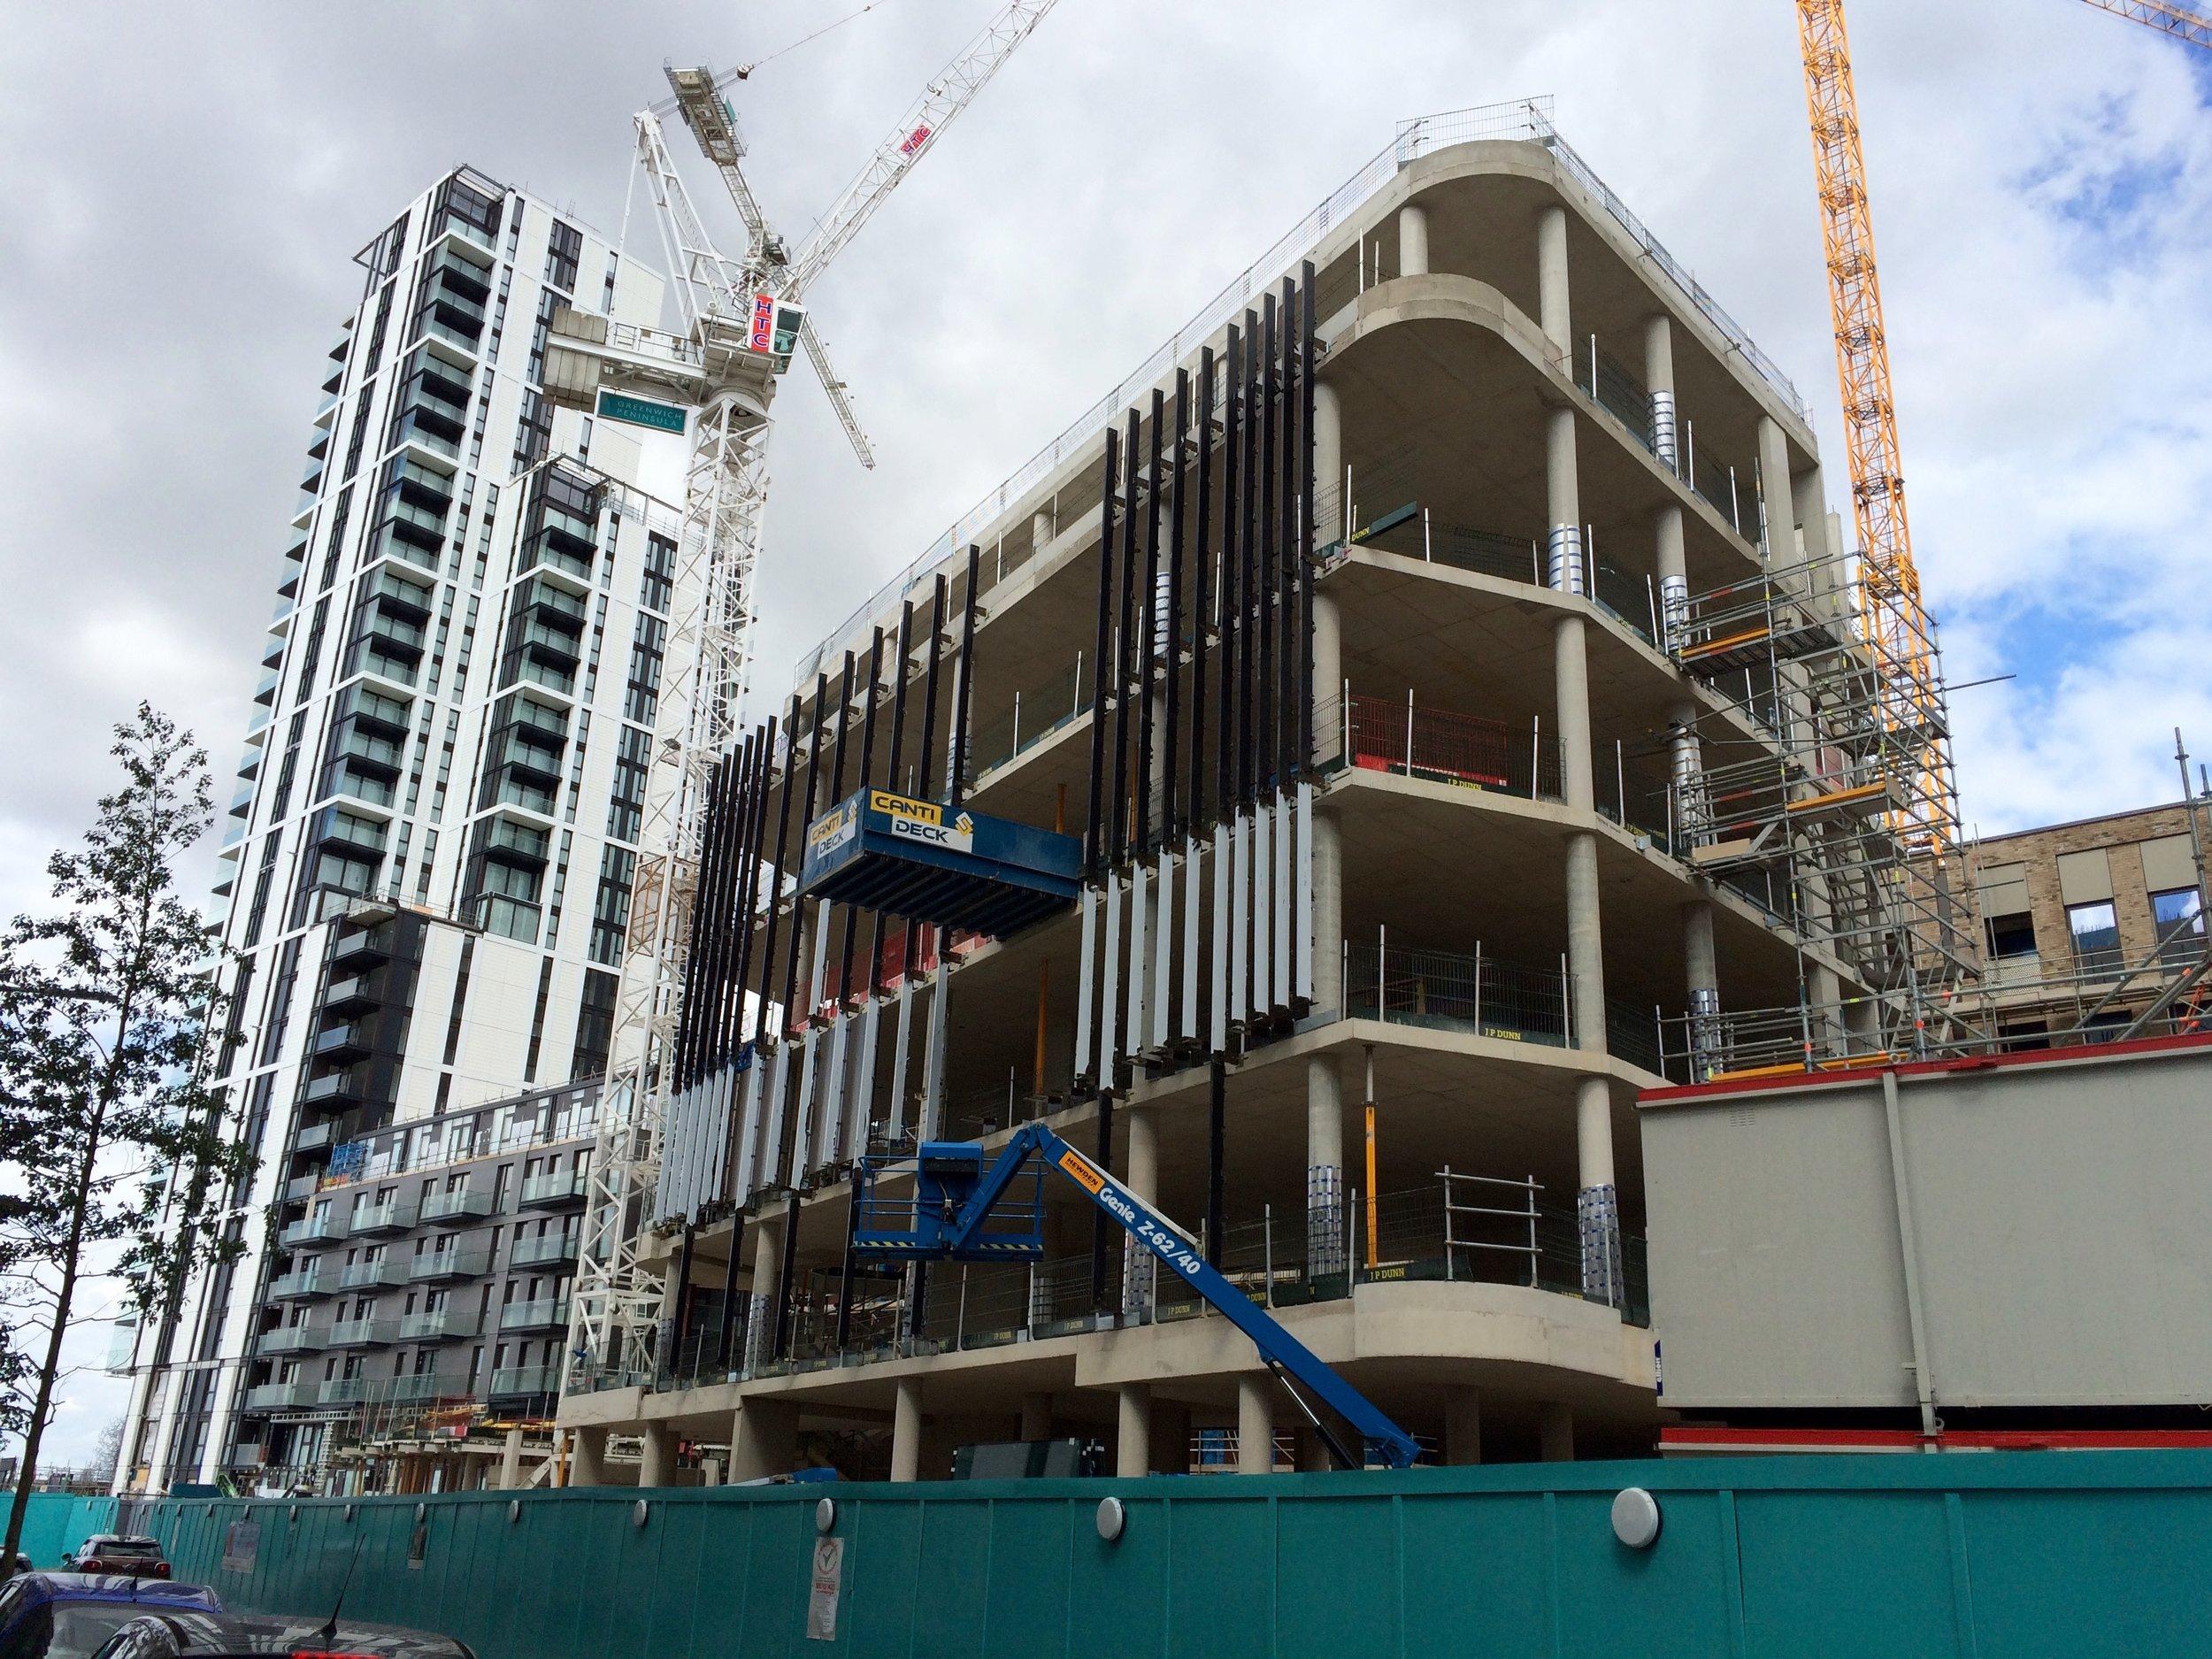 Construction progress of Aperture community hub, directly north of Fulmar - August 2016 [greenpen.london]